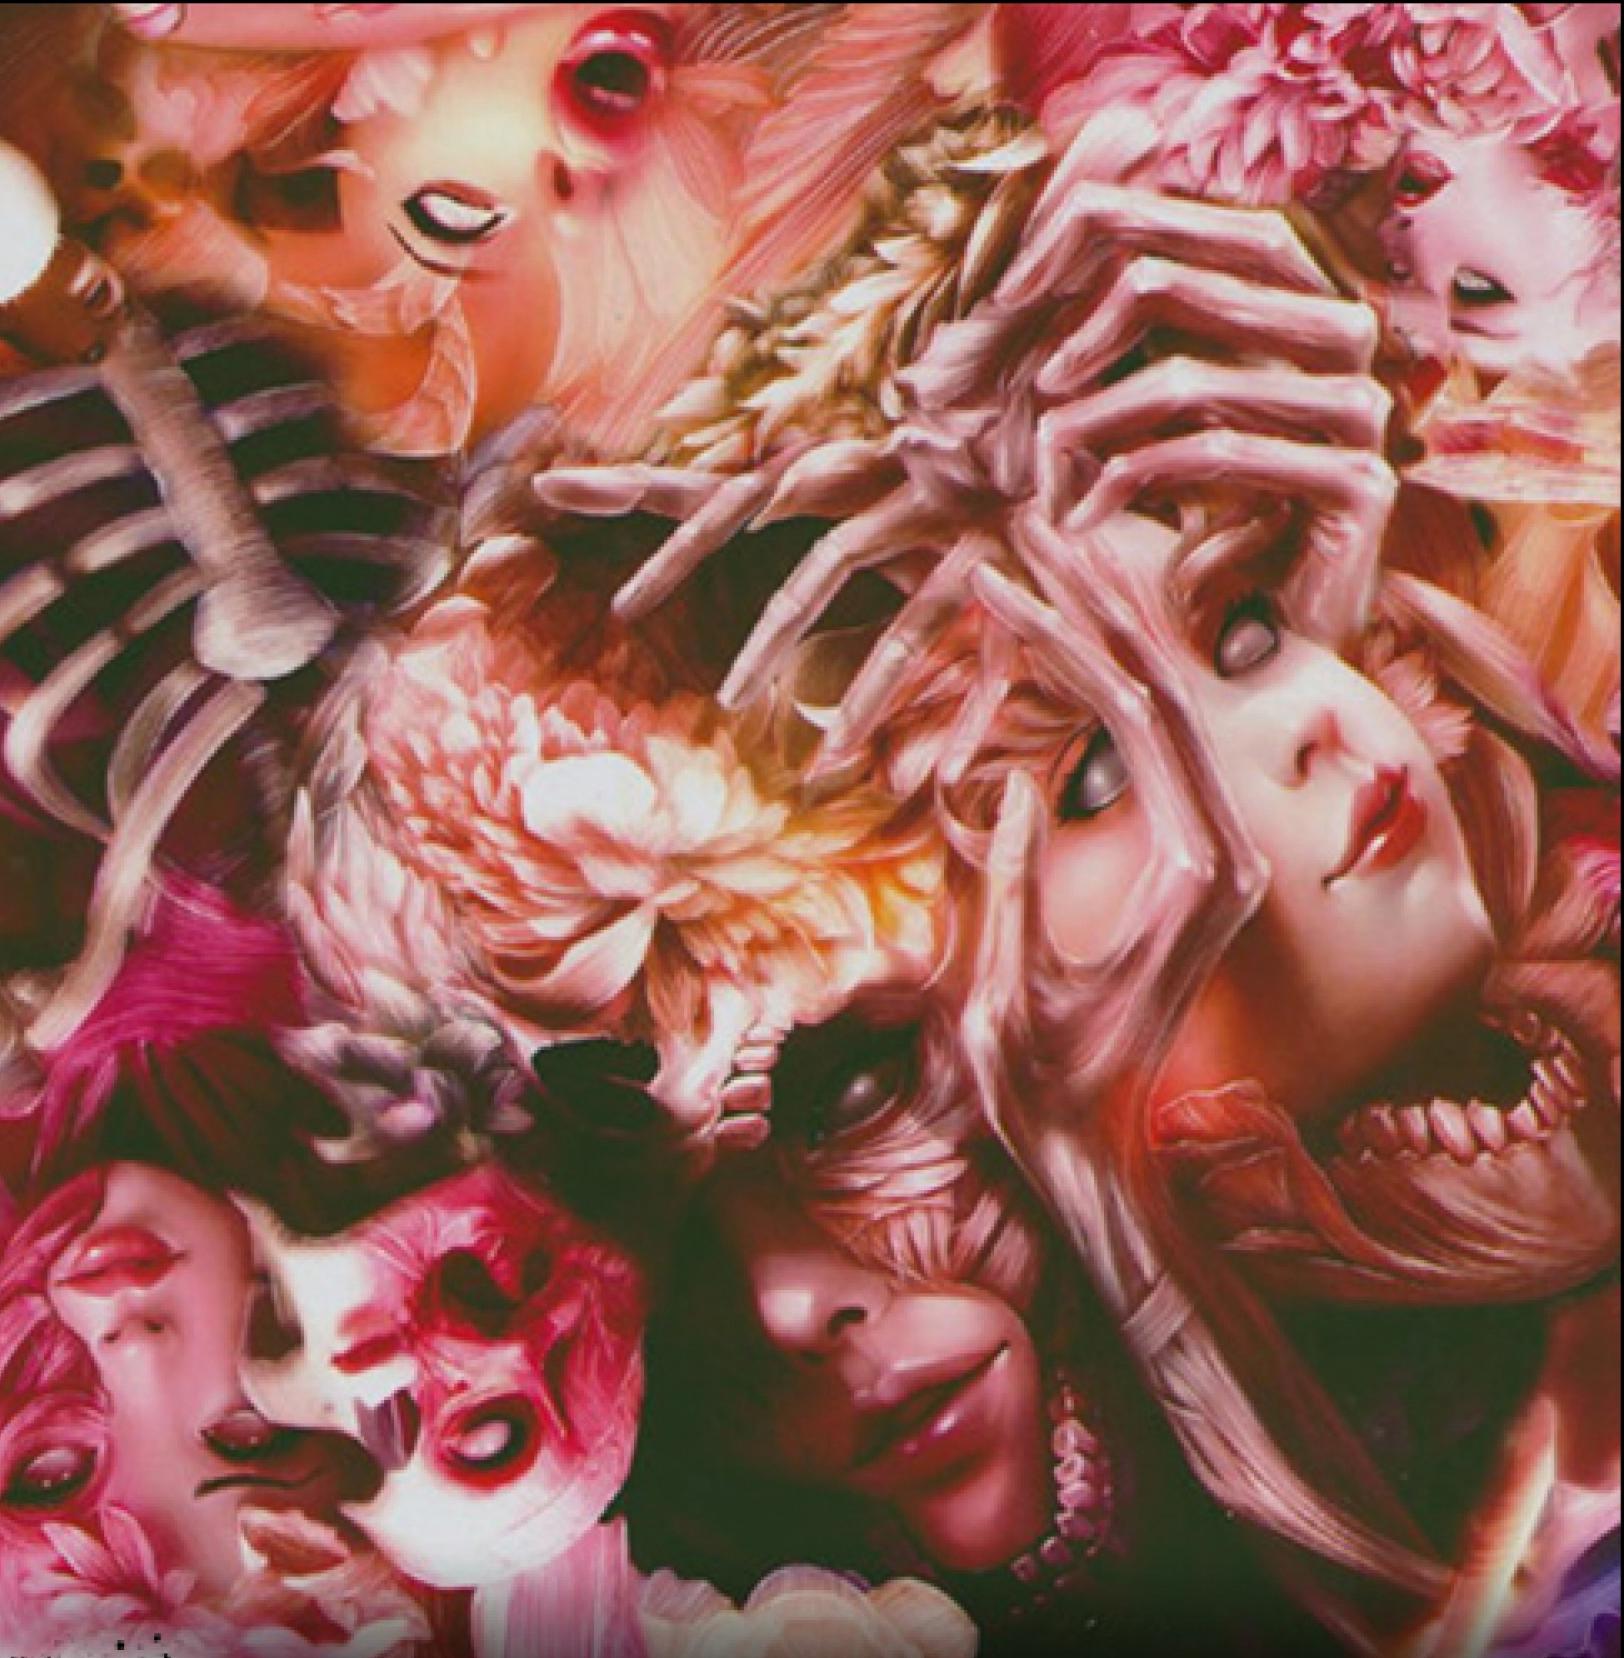 Msc190-haunting beauties